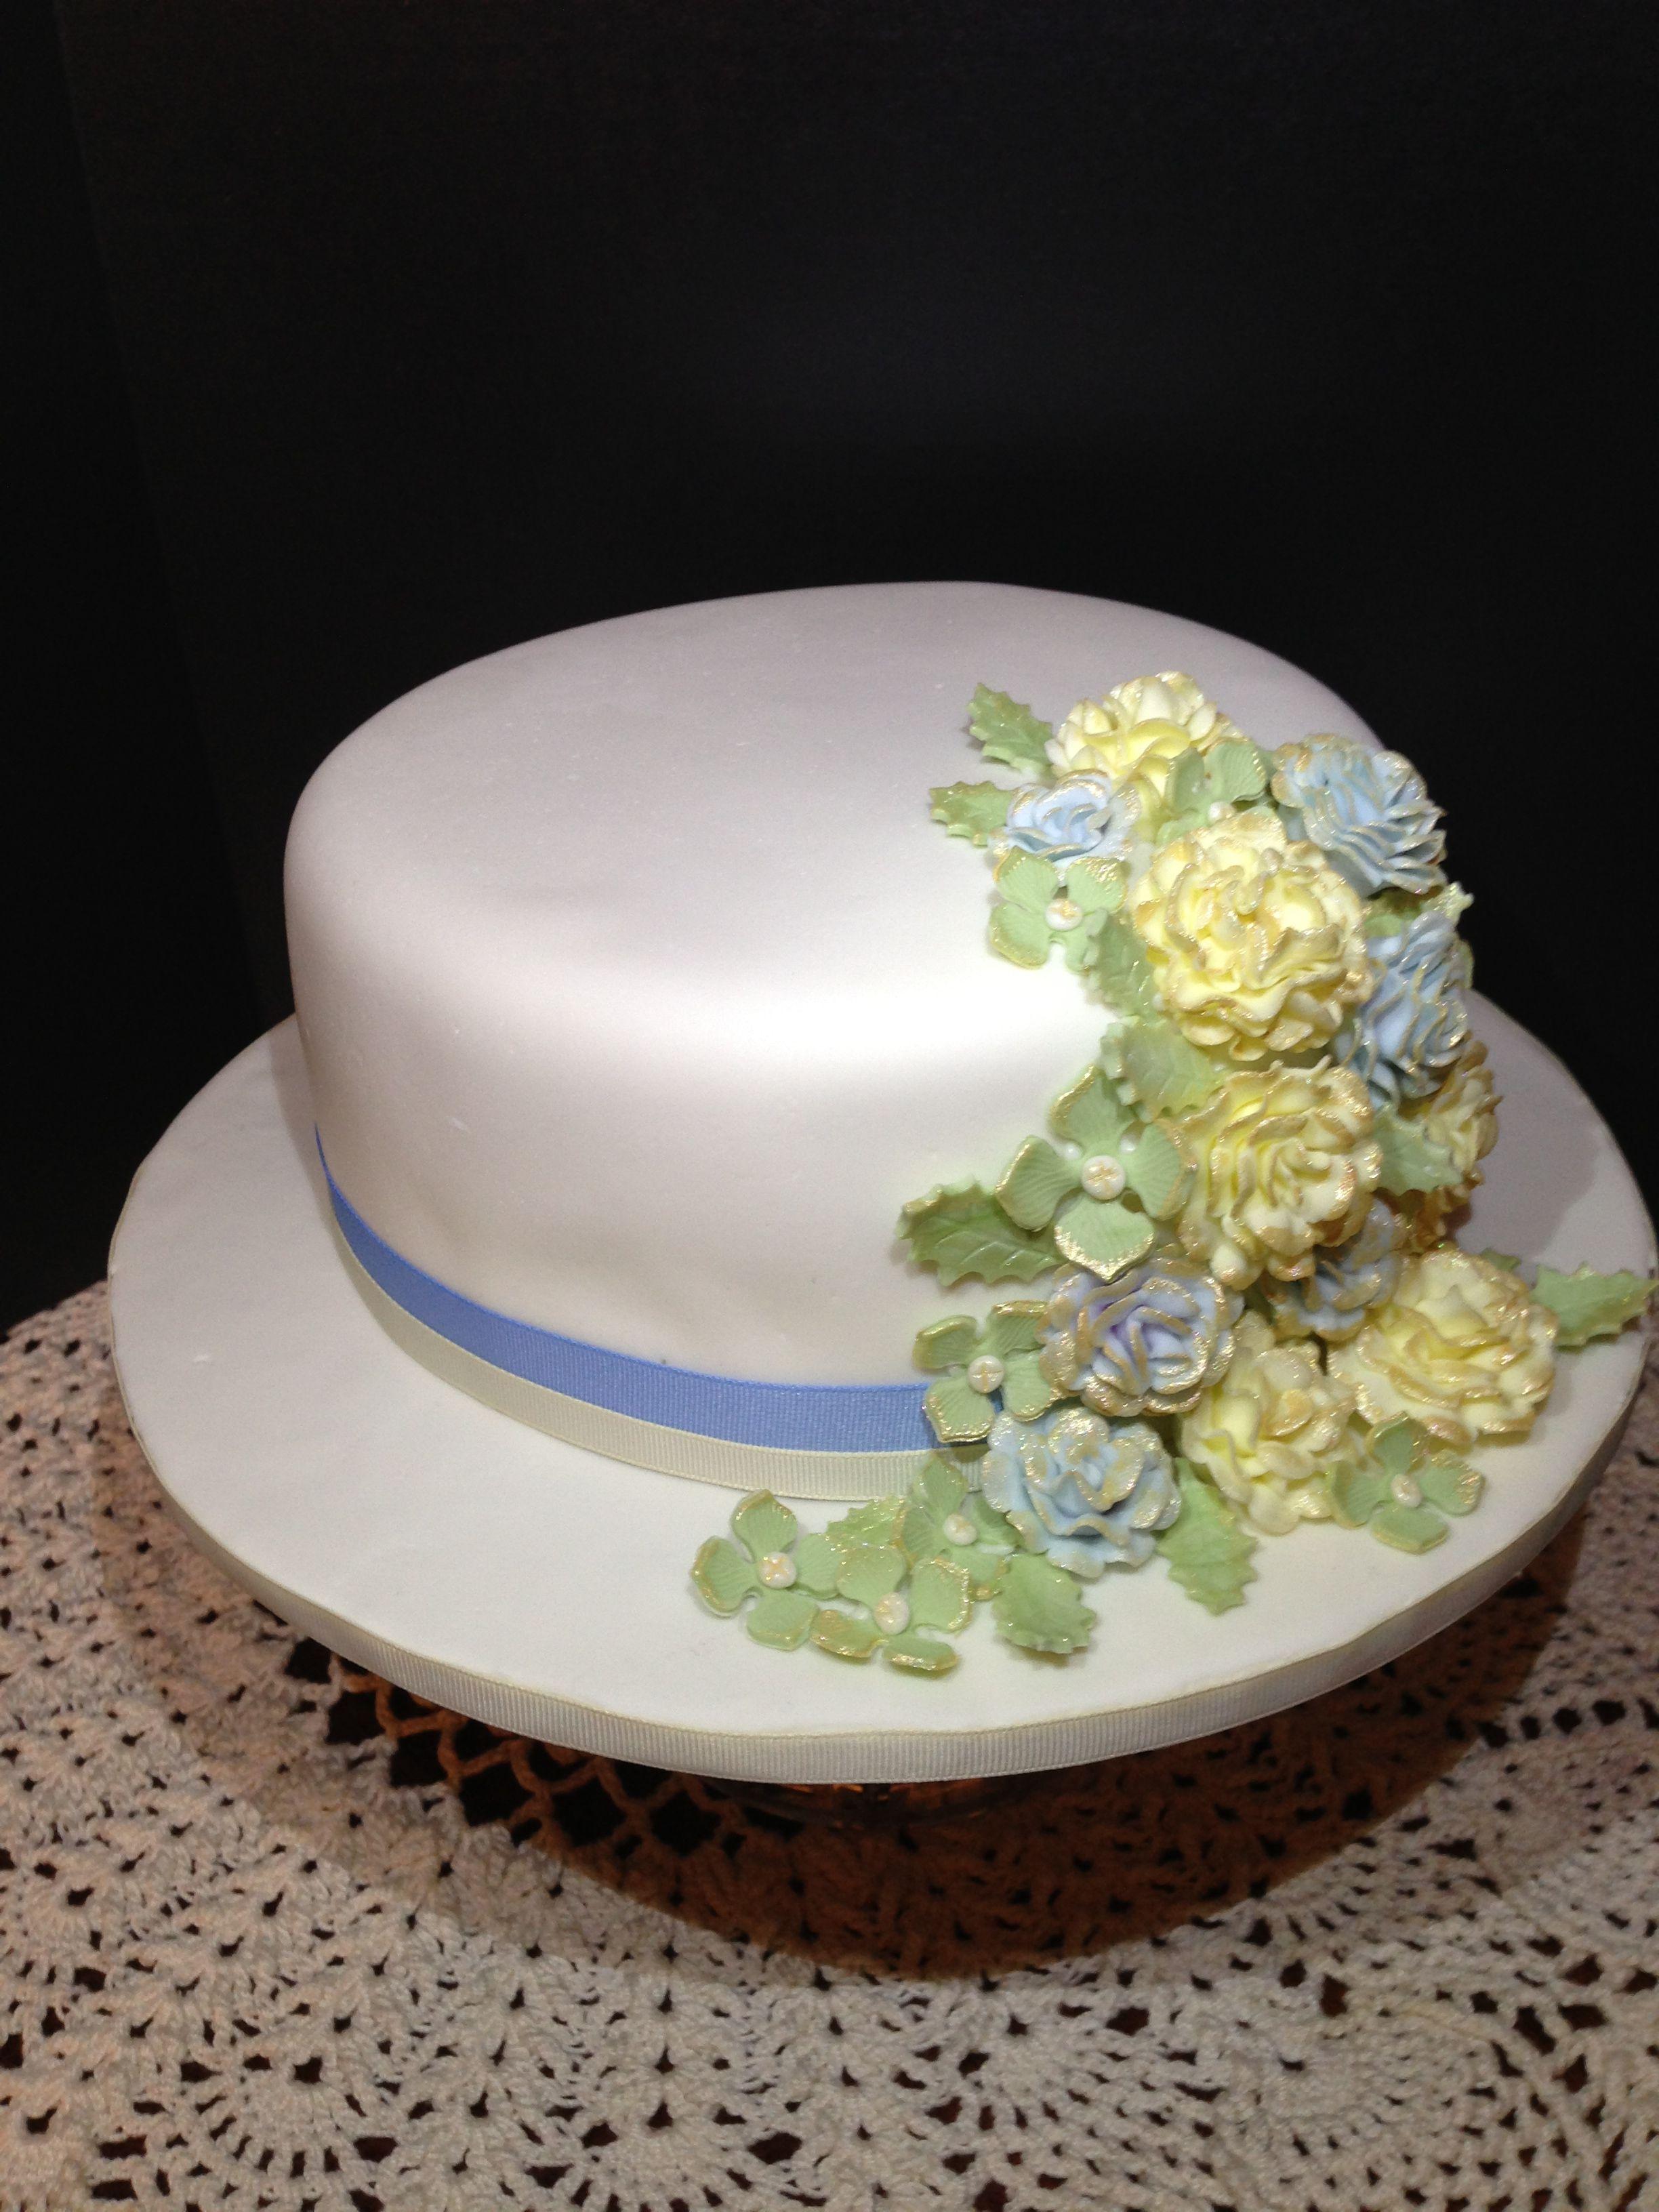 Épinglé par Jennifer Willard sur My Cakes